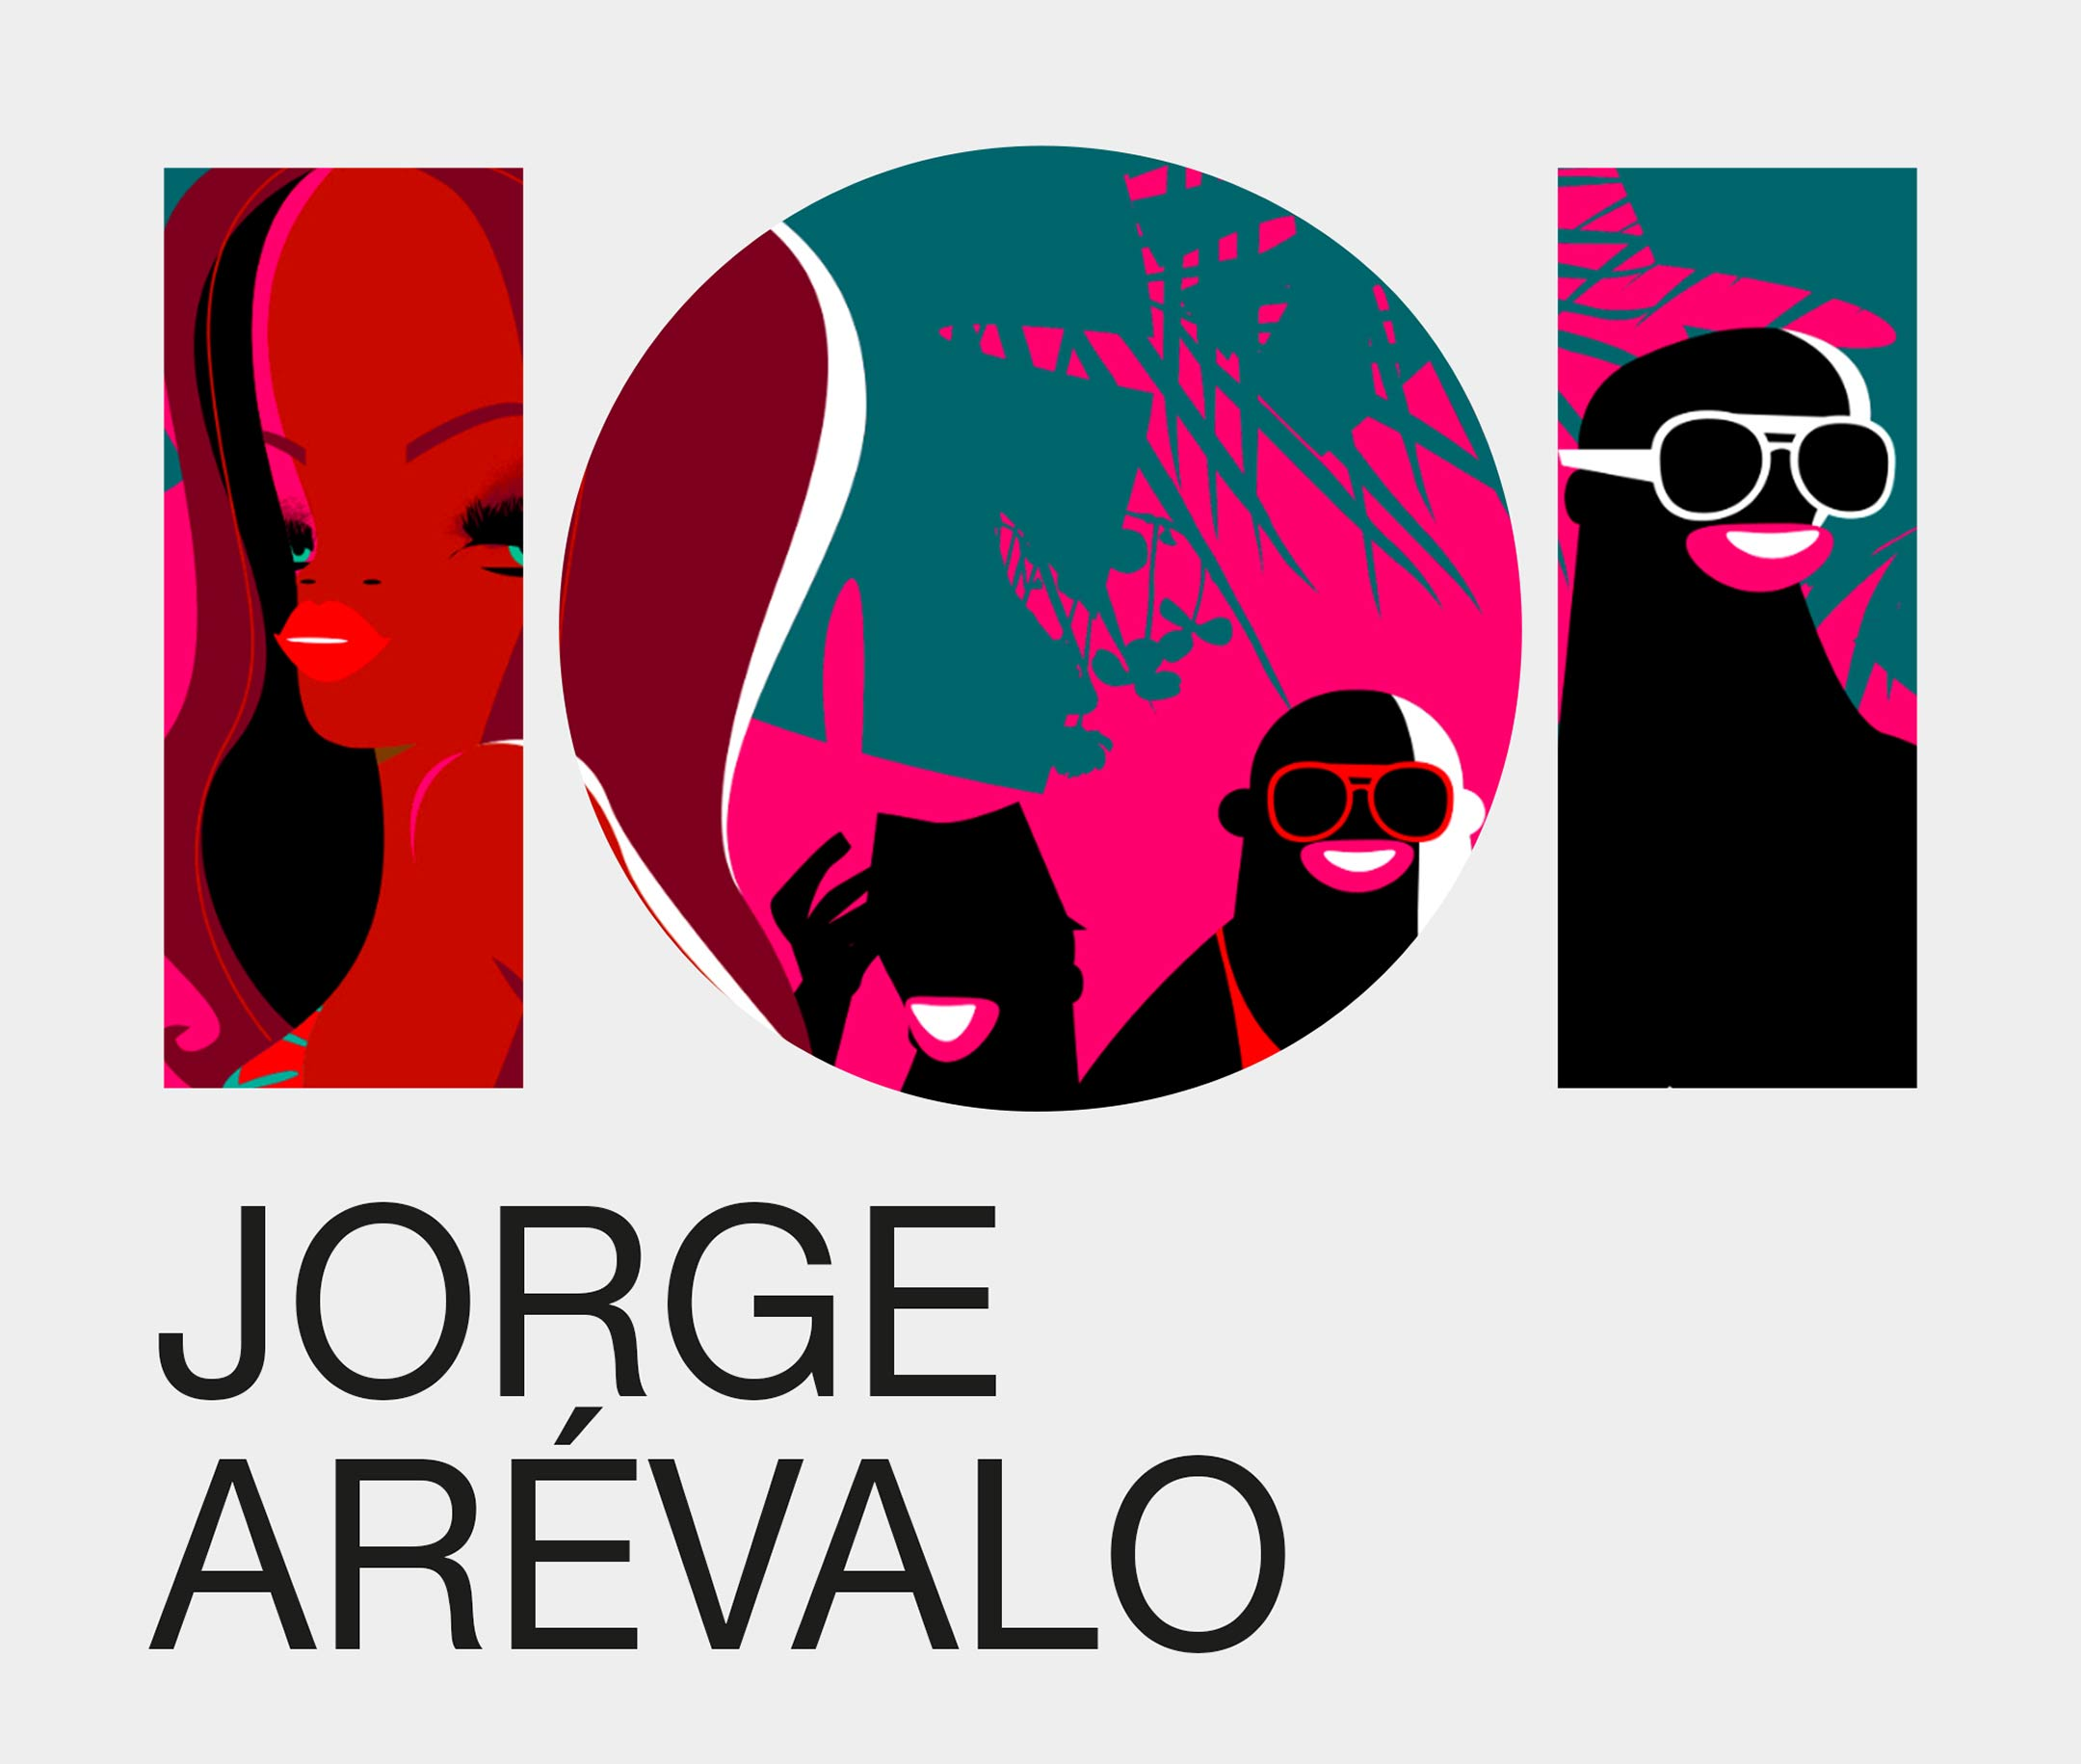 JORGE-AREVALO_IG